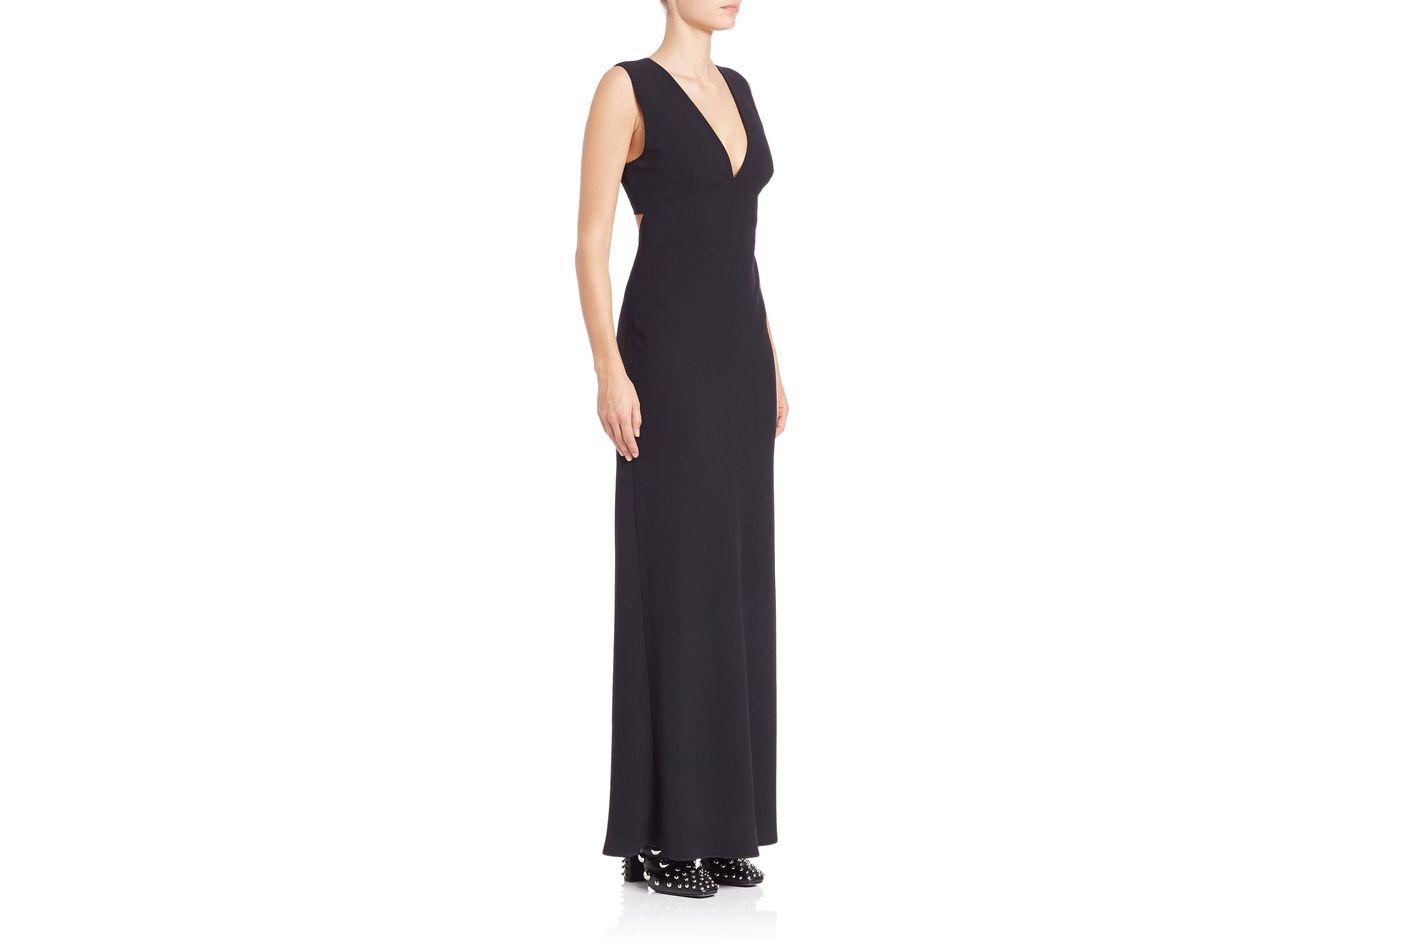 T by Alexander Wang Solid Sleeveless Maxi Dress